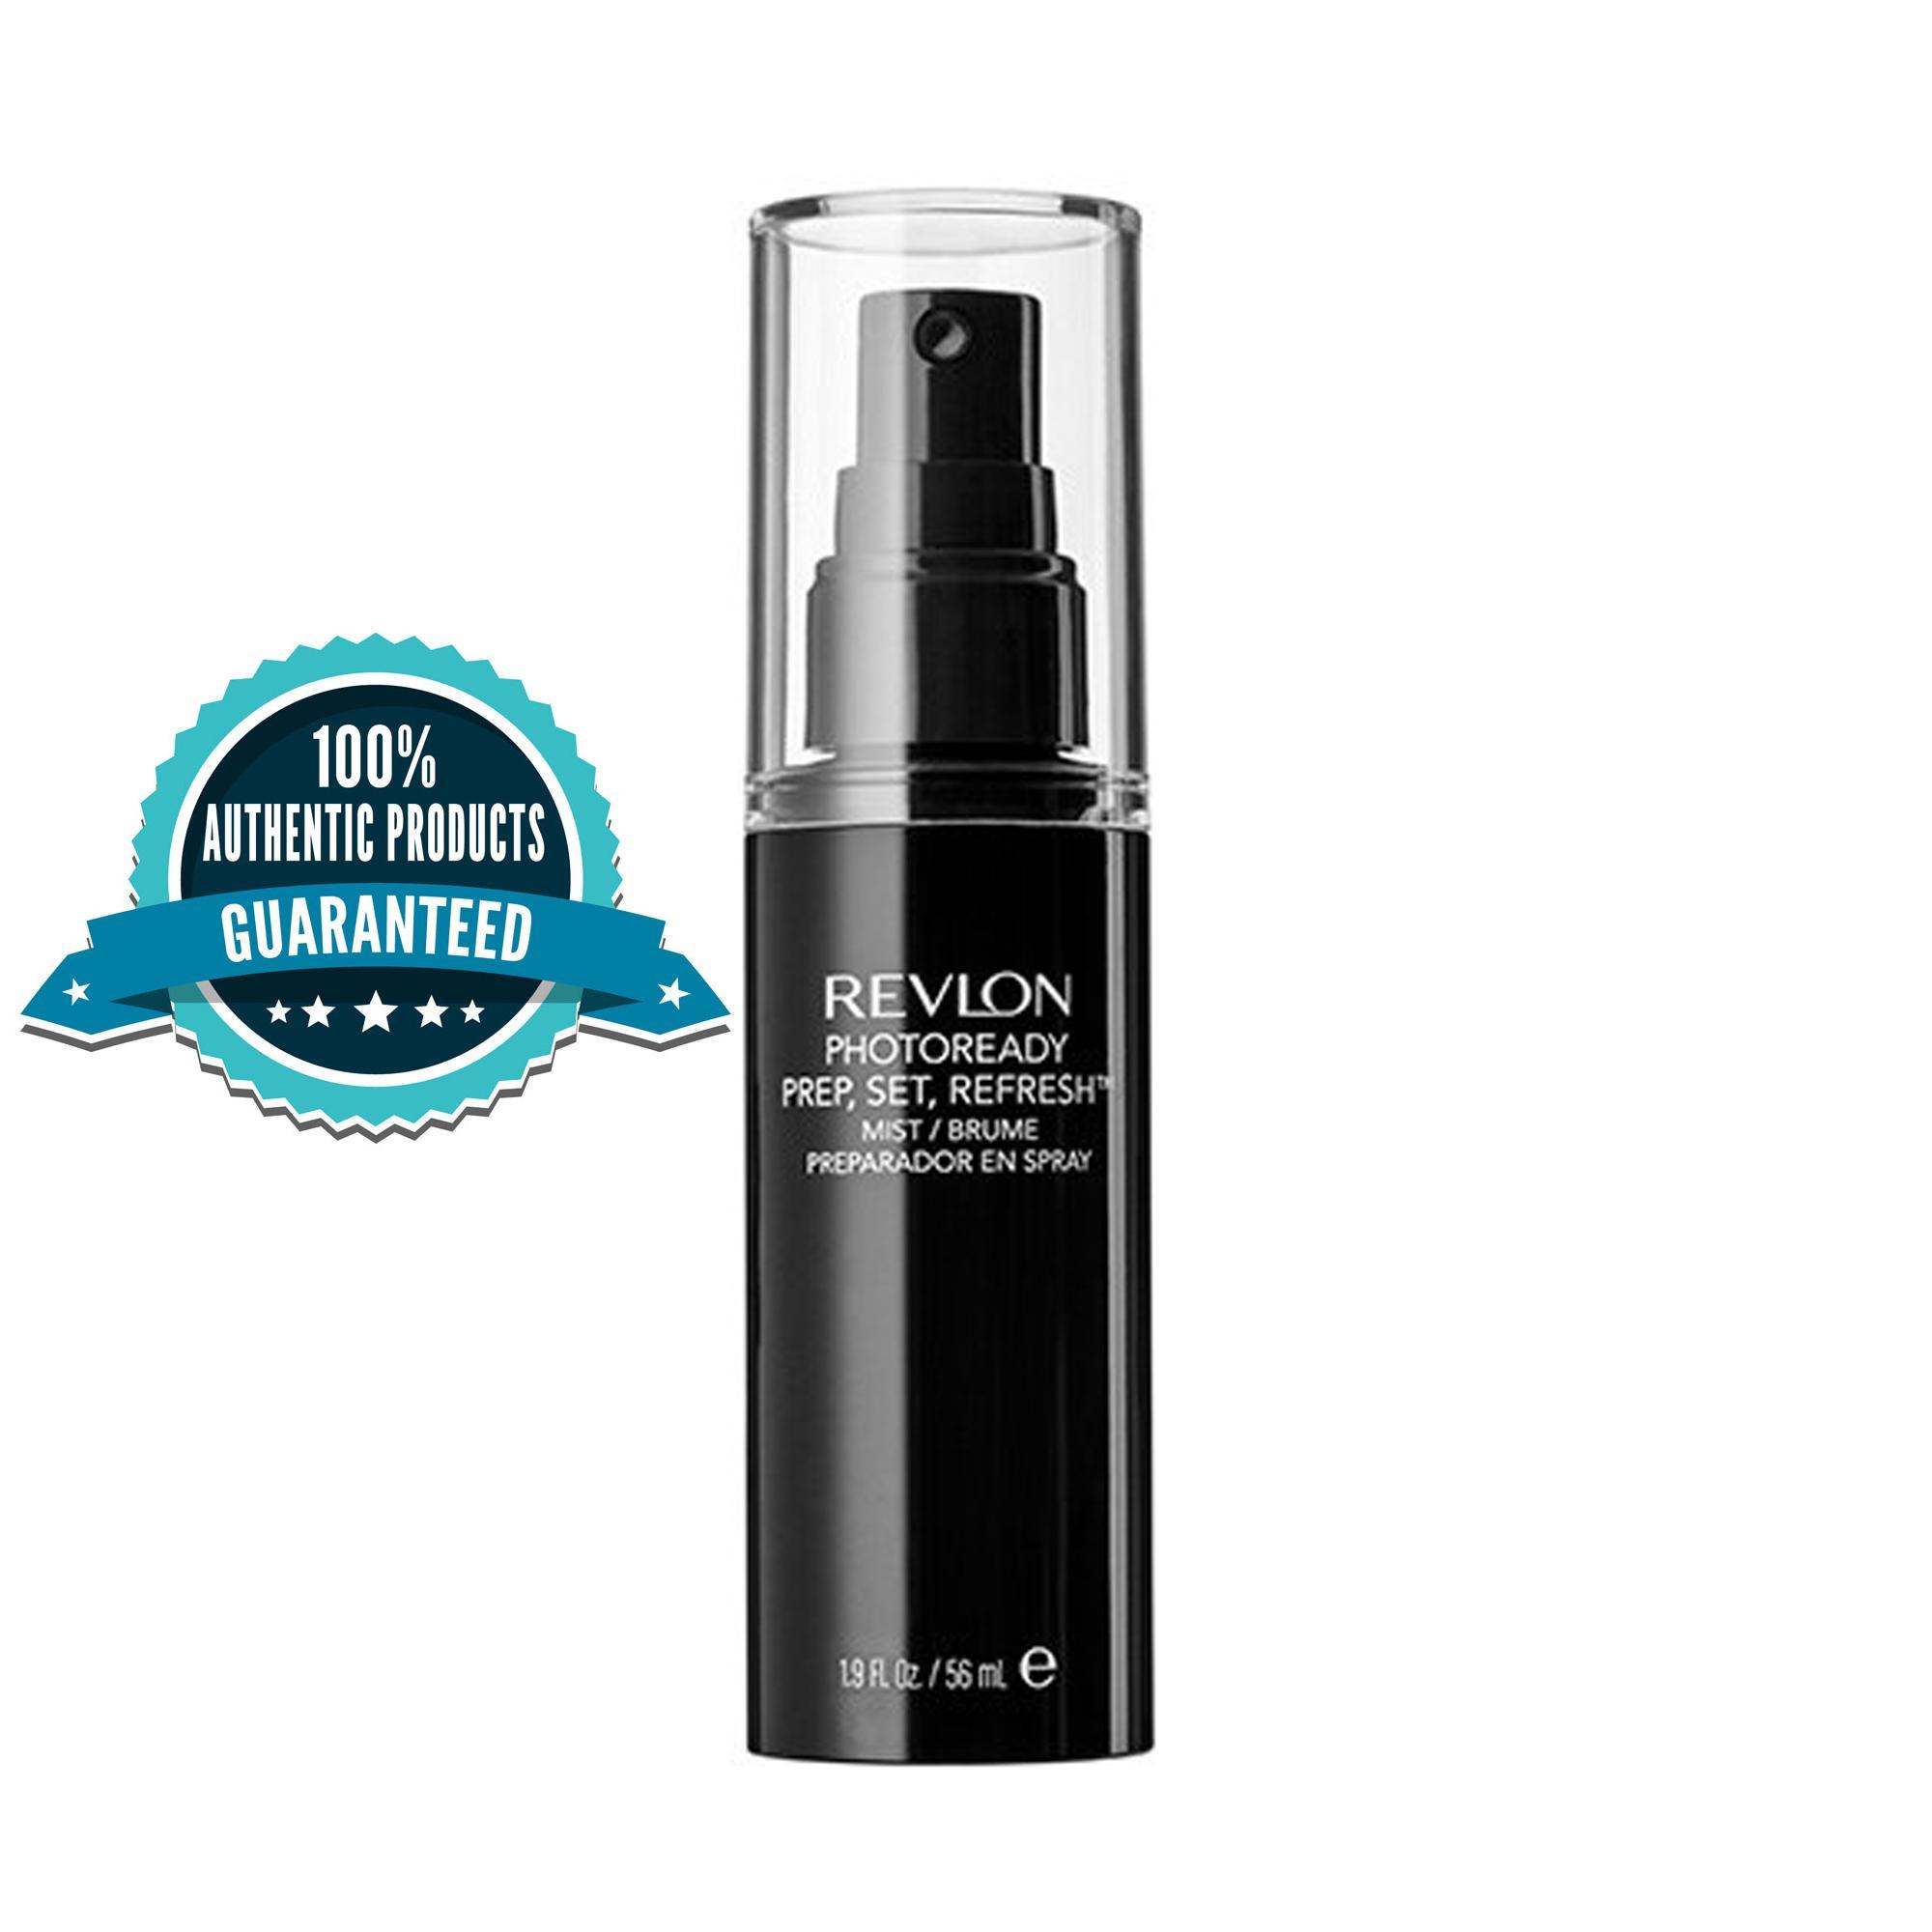 Buy Sell Cheapest Bedak Revlon Photoready Best Quality Product Airbrush Effect Makeup Nude Setting Spray Prep Set Refresh Mist